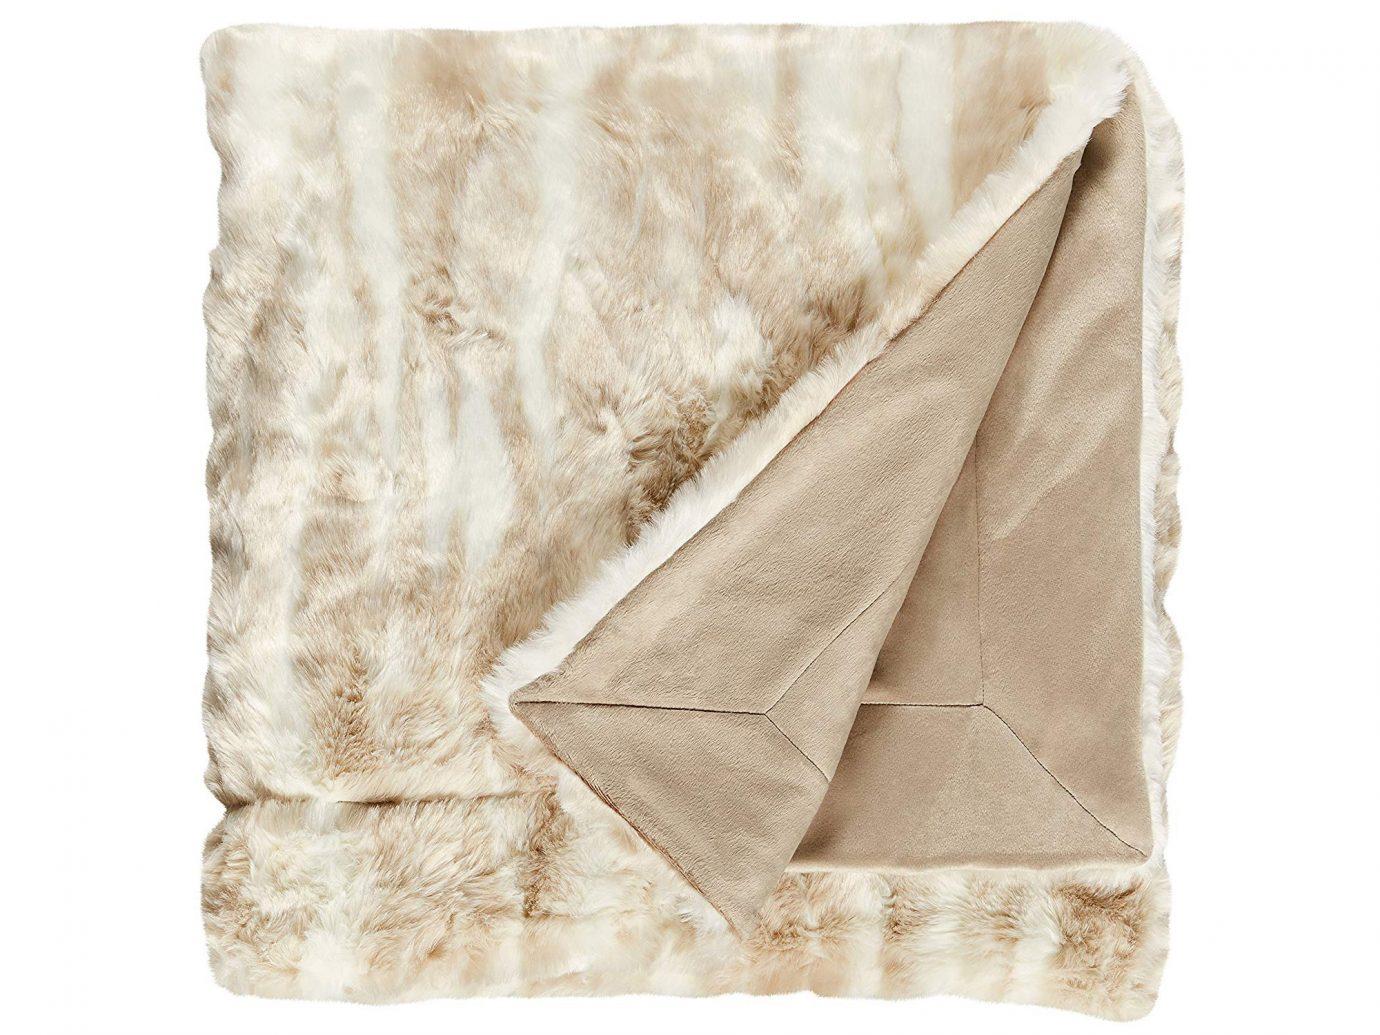 Stone & Beam Marble Faux Fur Throw Blanket